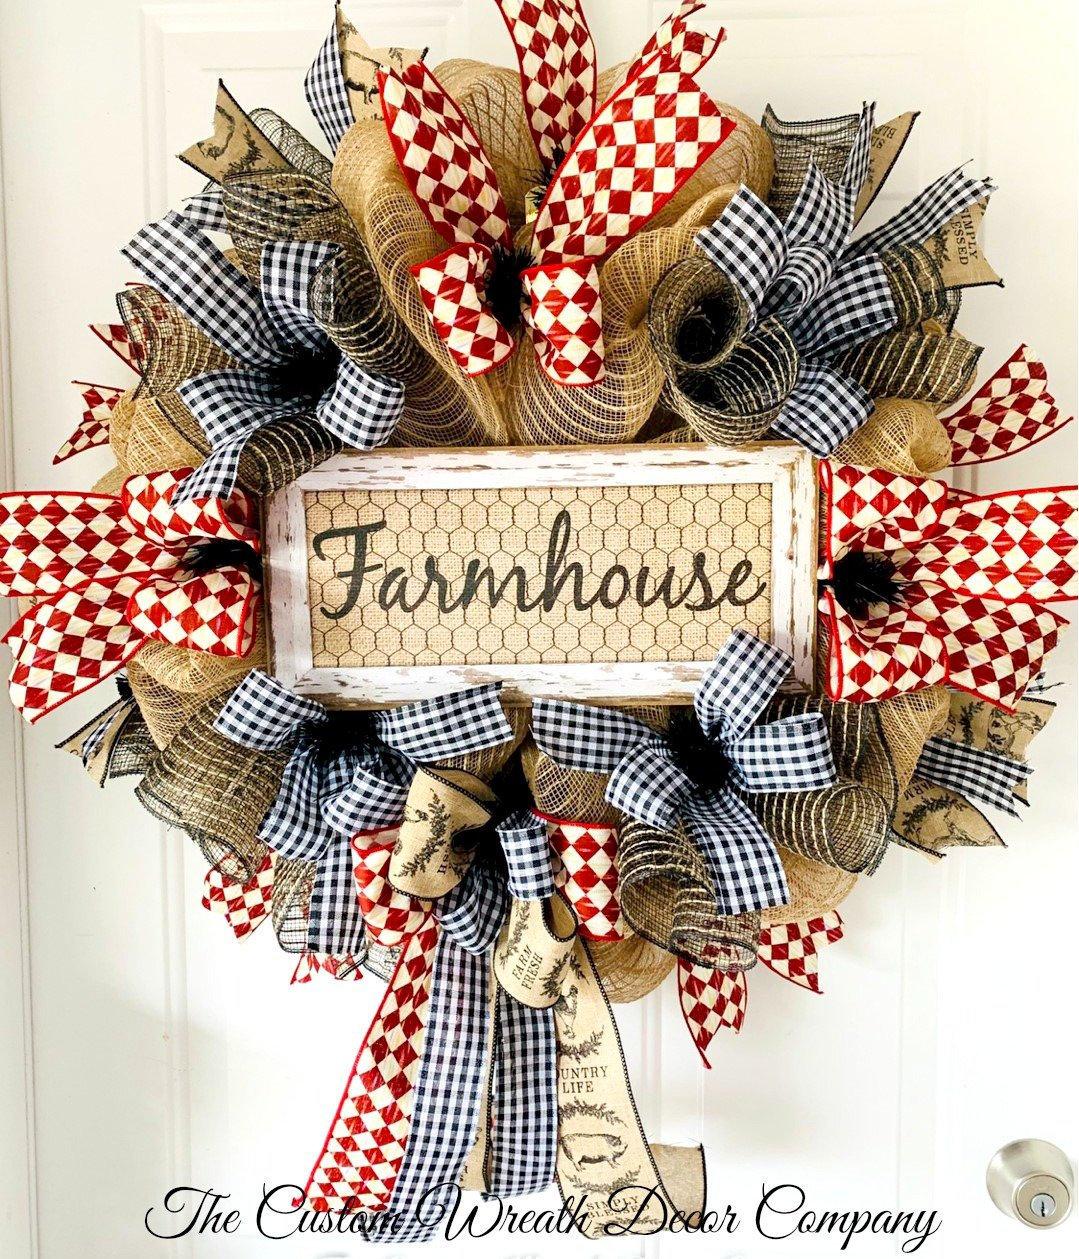 Farmhouse Wreath Farmhouse Burlap Wreath Rustic Farmhouse Wreath Red Black Plaid Wreath Country Mesh Wreath Farm Wreath